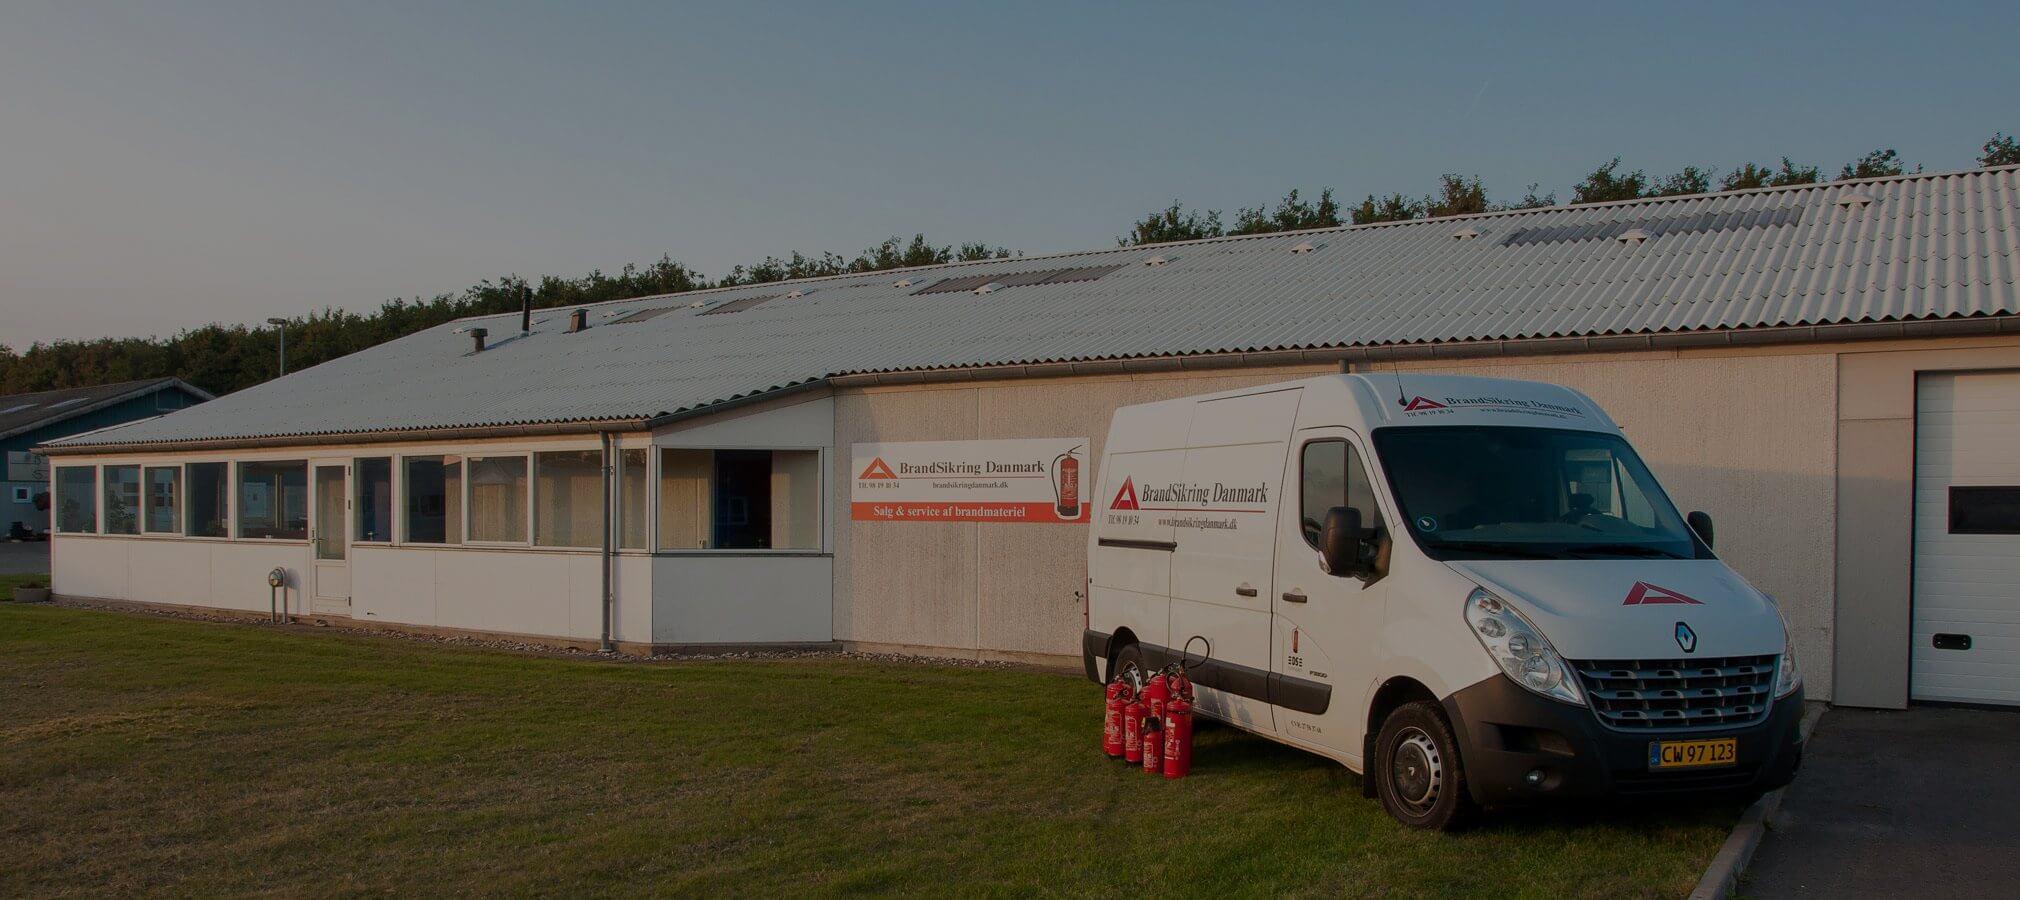 BrandSikring Danmark firmalokation